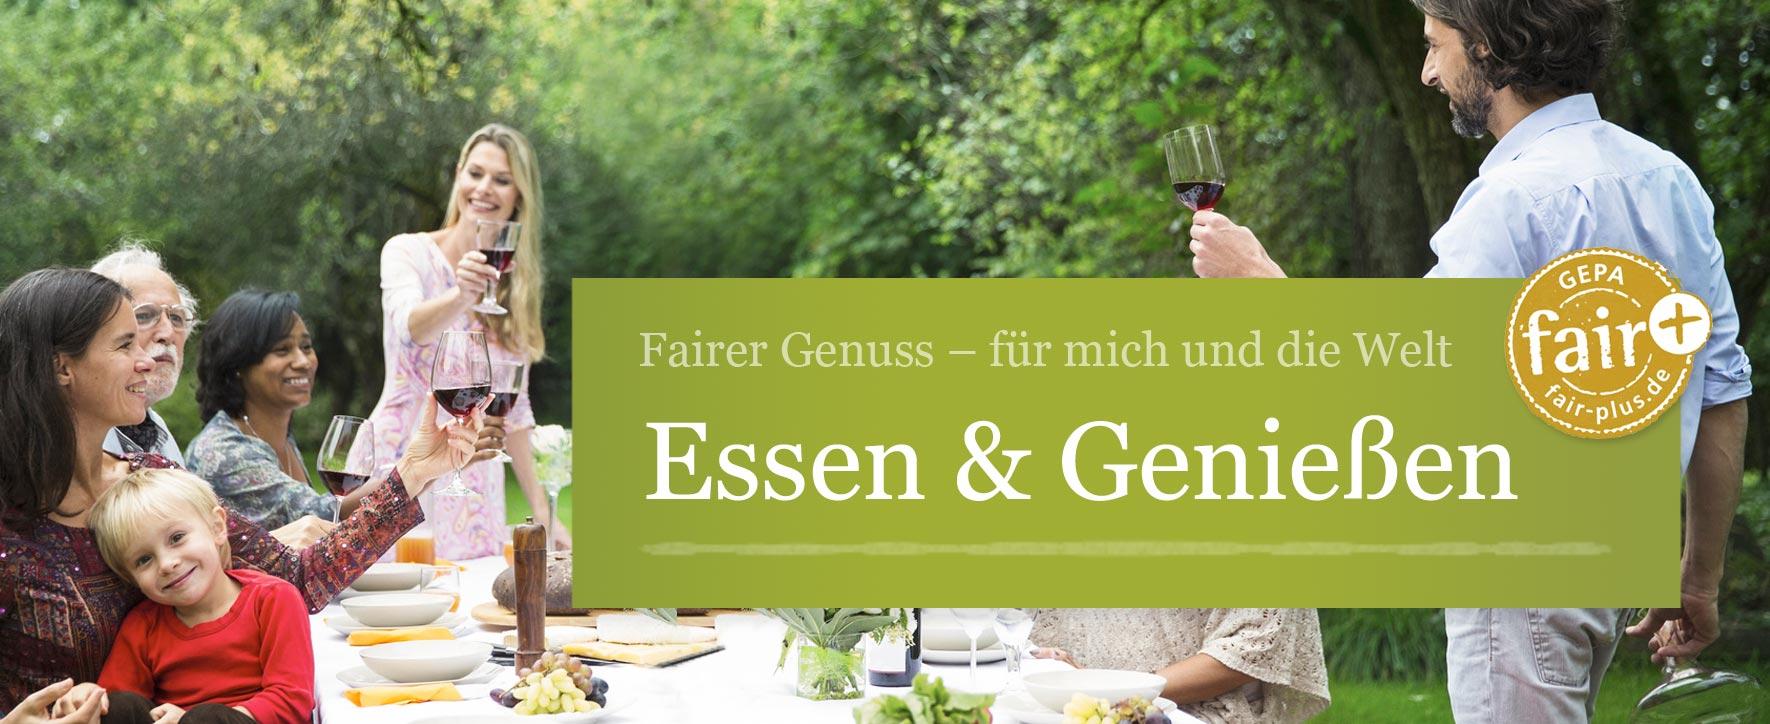 Essen & Genießen – Foto: © Westend61, Fotolia.com